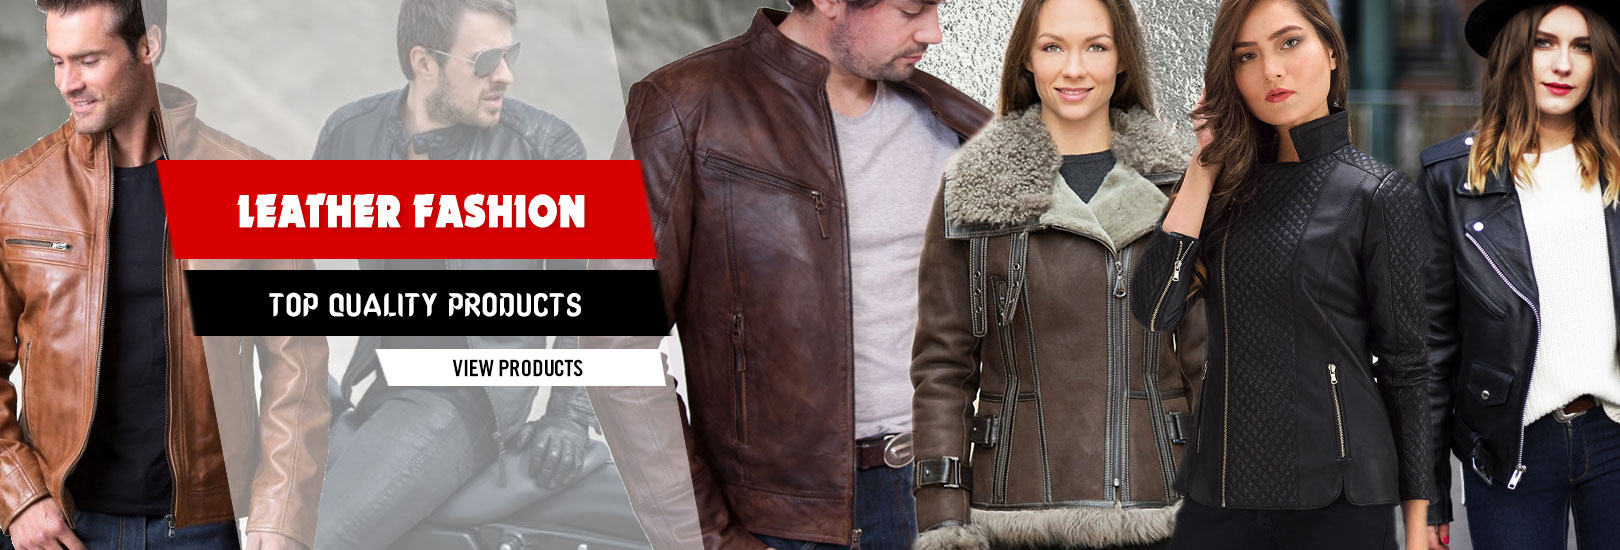 leather-fashion-jackets